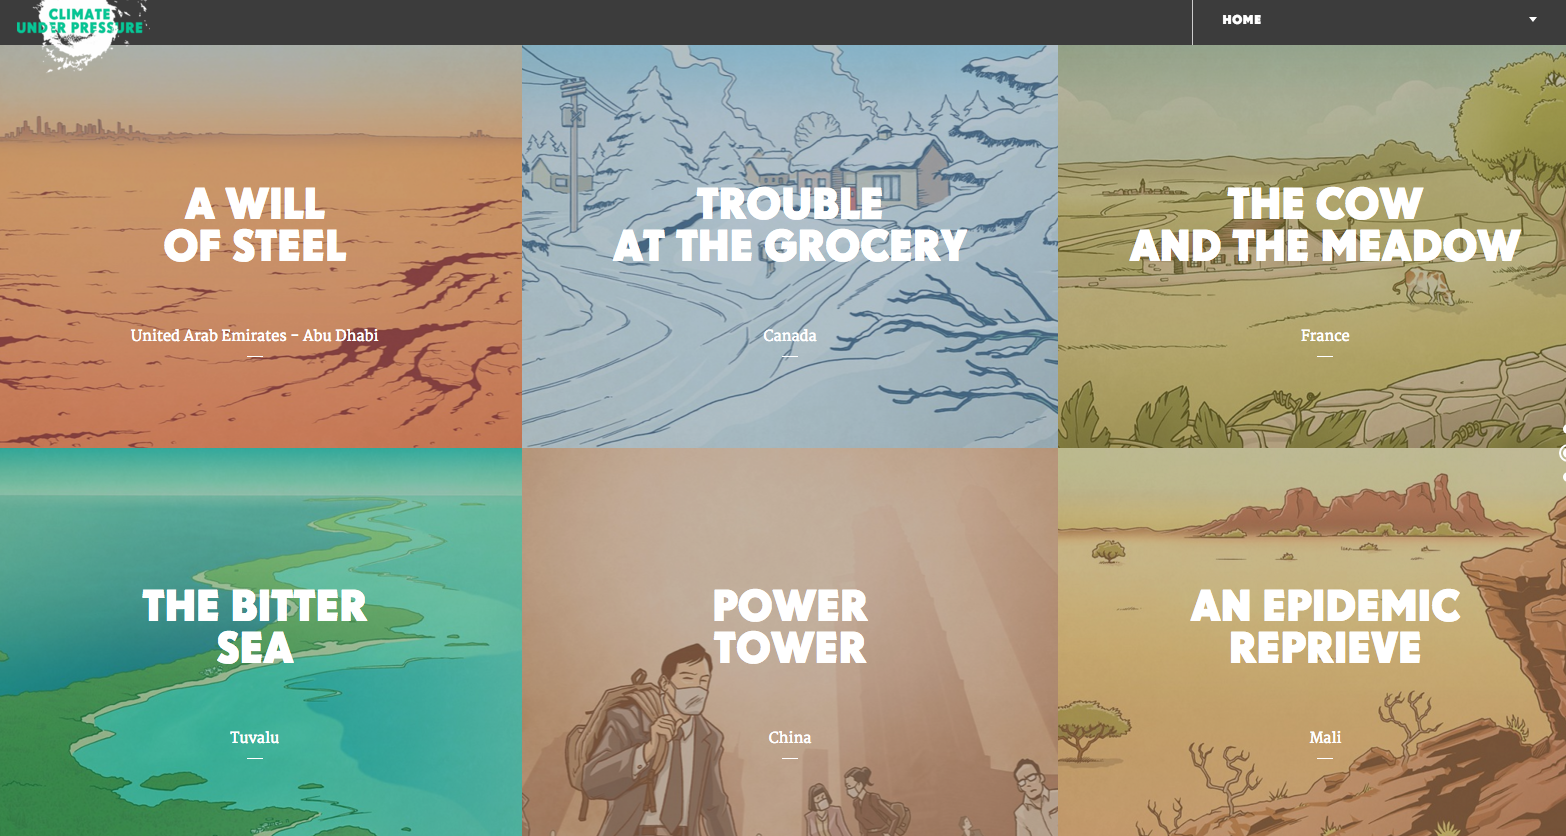 Best Websites of 2015 - Climate Under Pressure